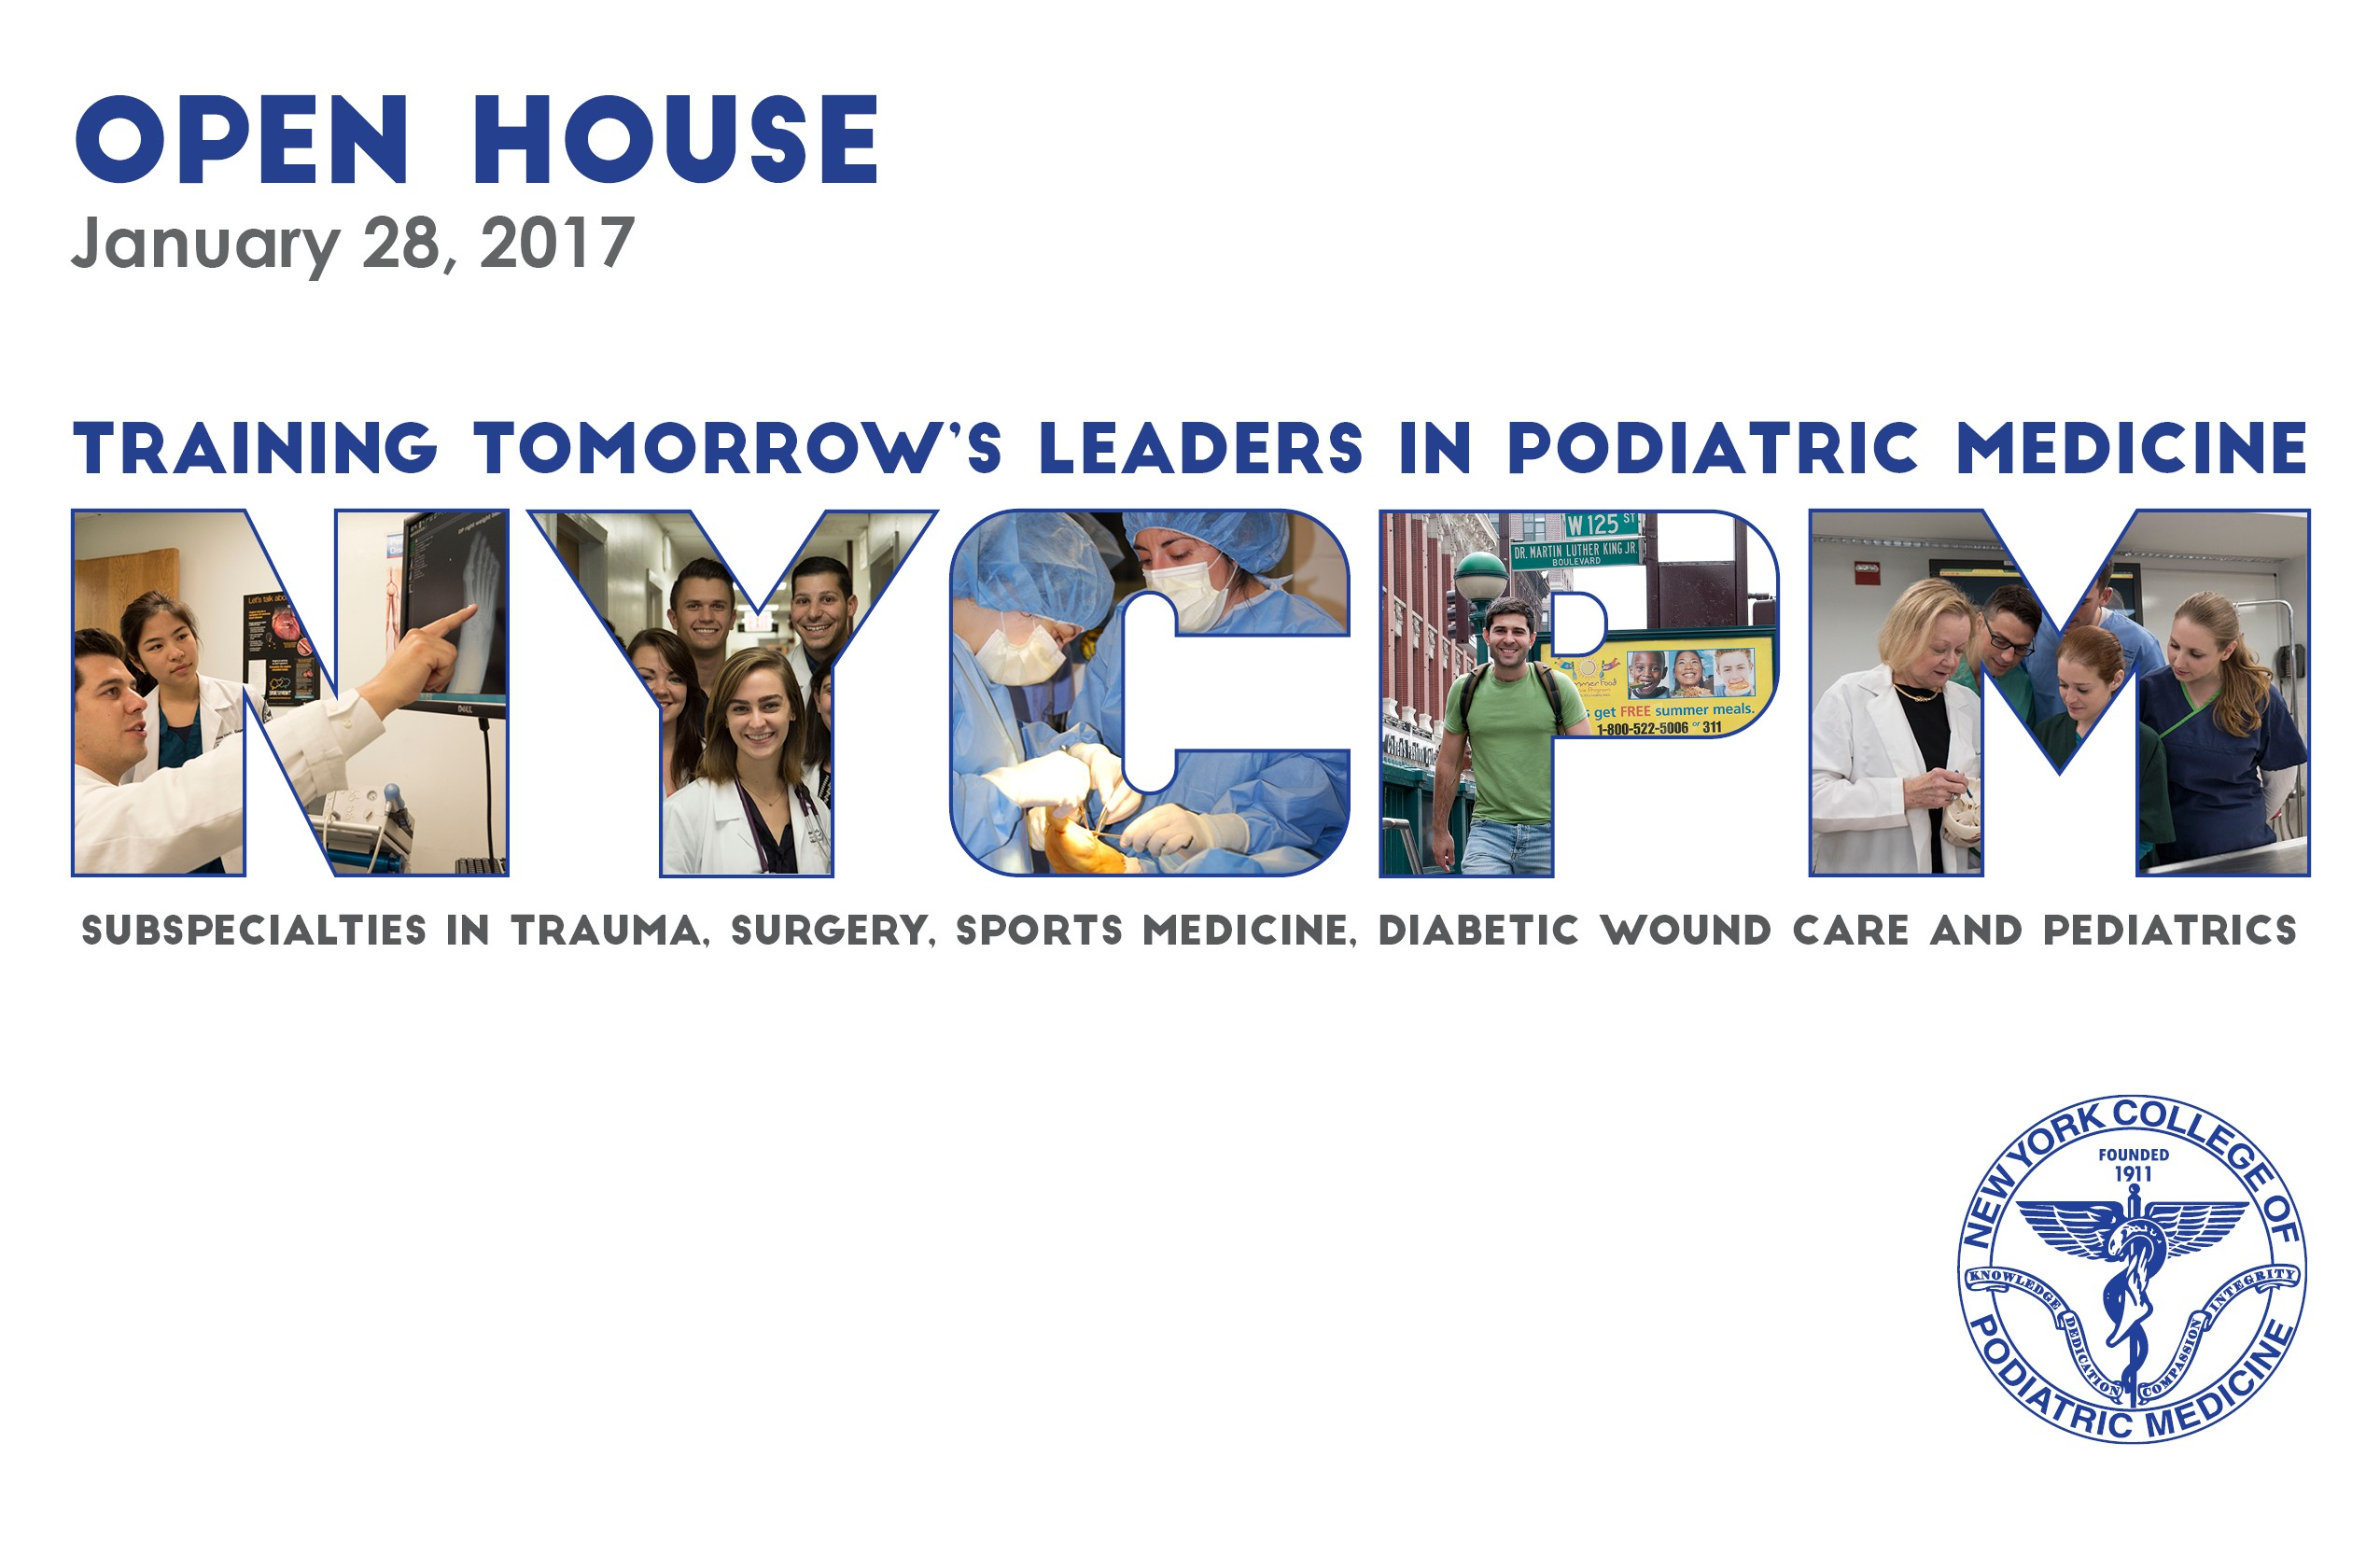 New York College of Podiatric Medicine | LinkedIn